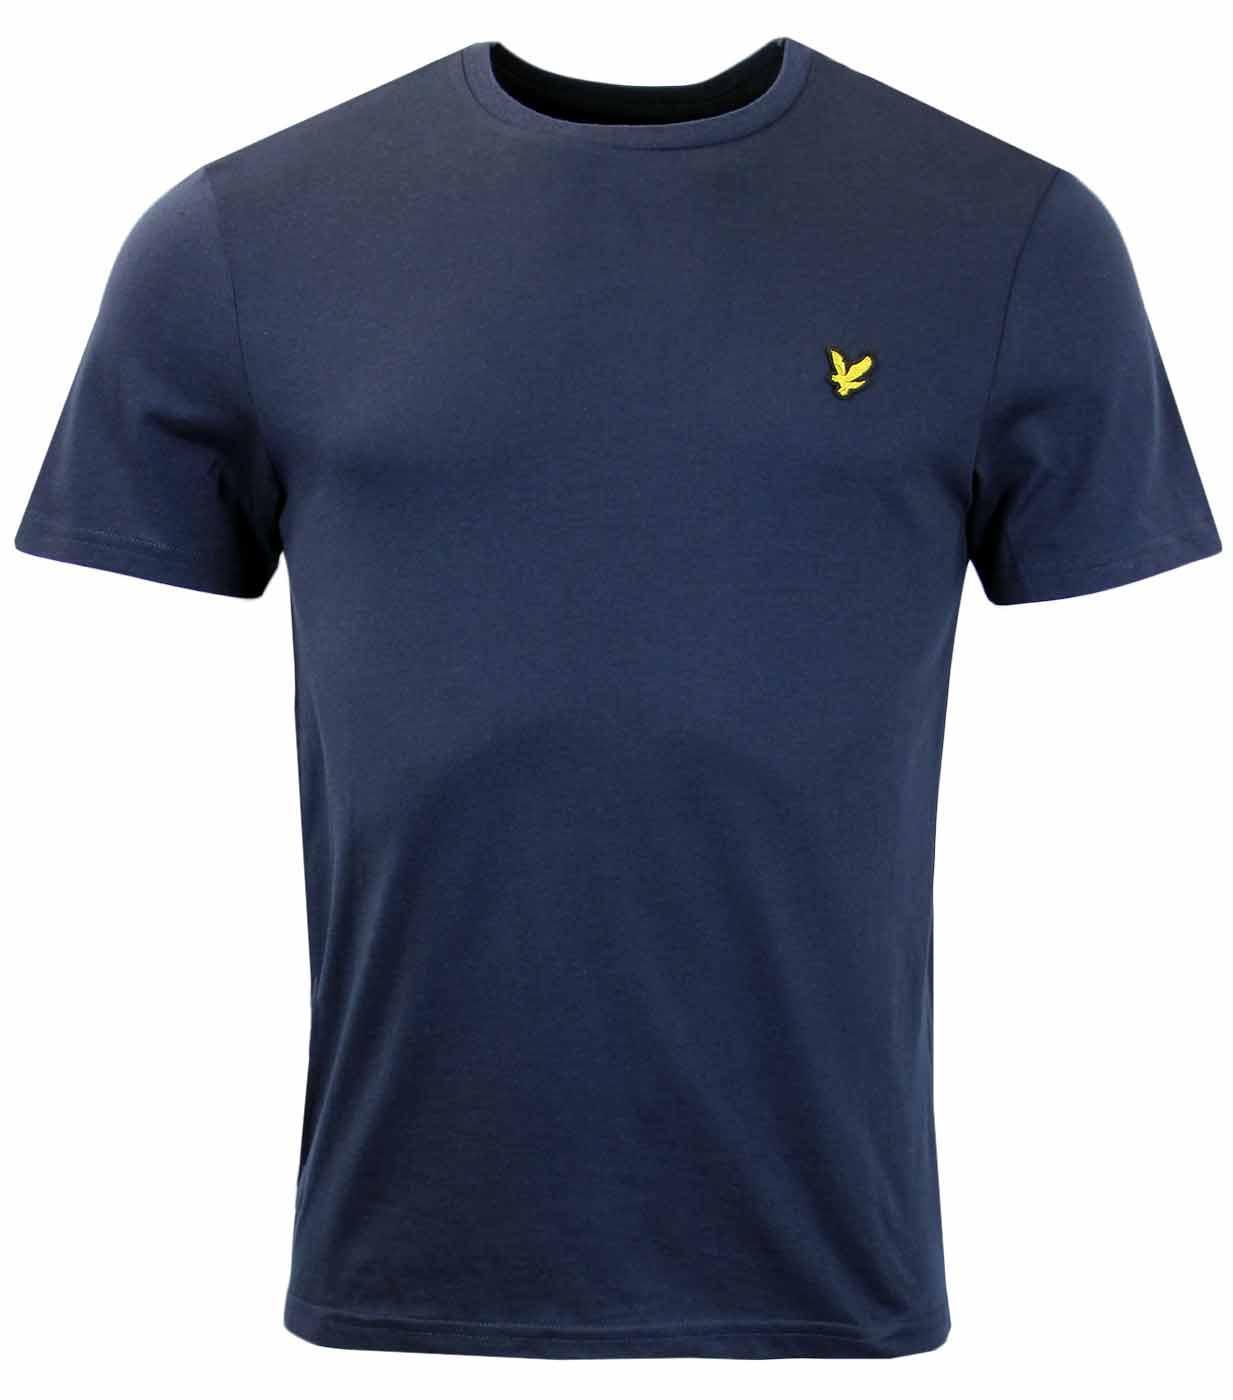 LYLE & SCOTT Retro Plain Golden Eagle T-Shirt NN